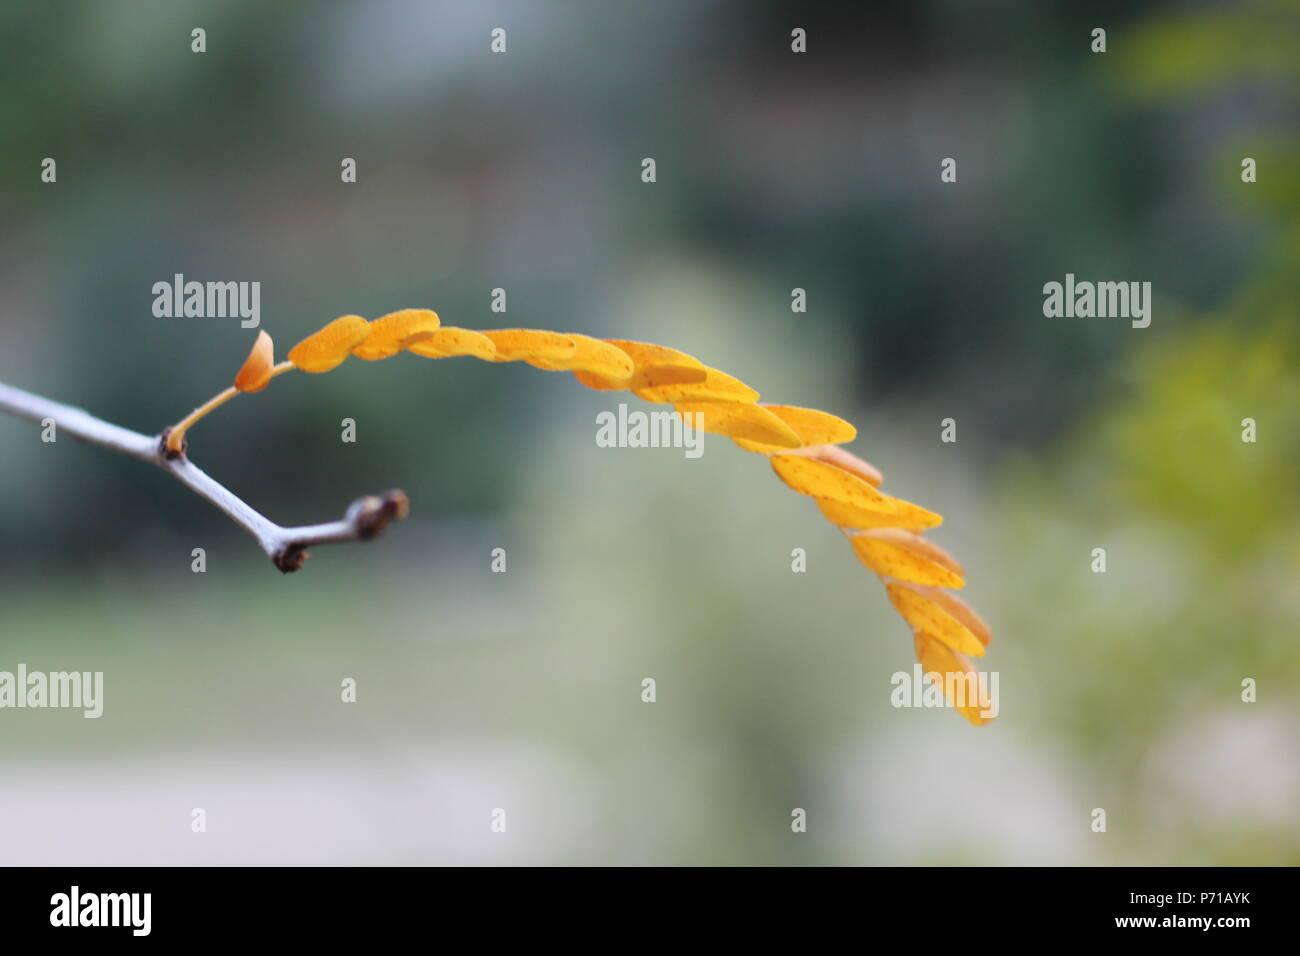 Plant in focus - Stock Image